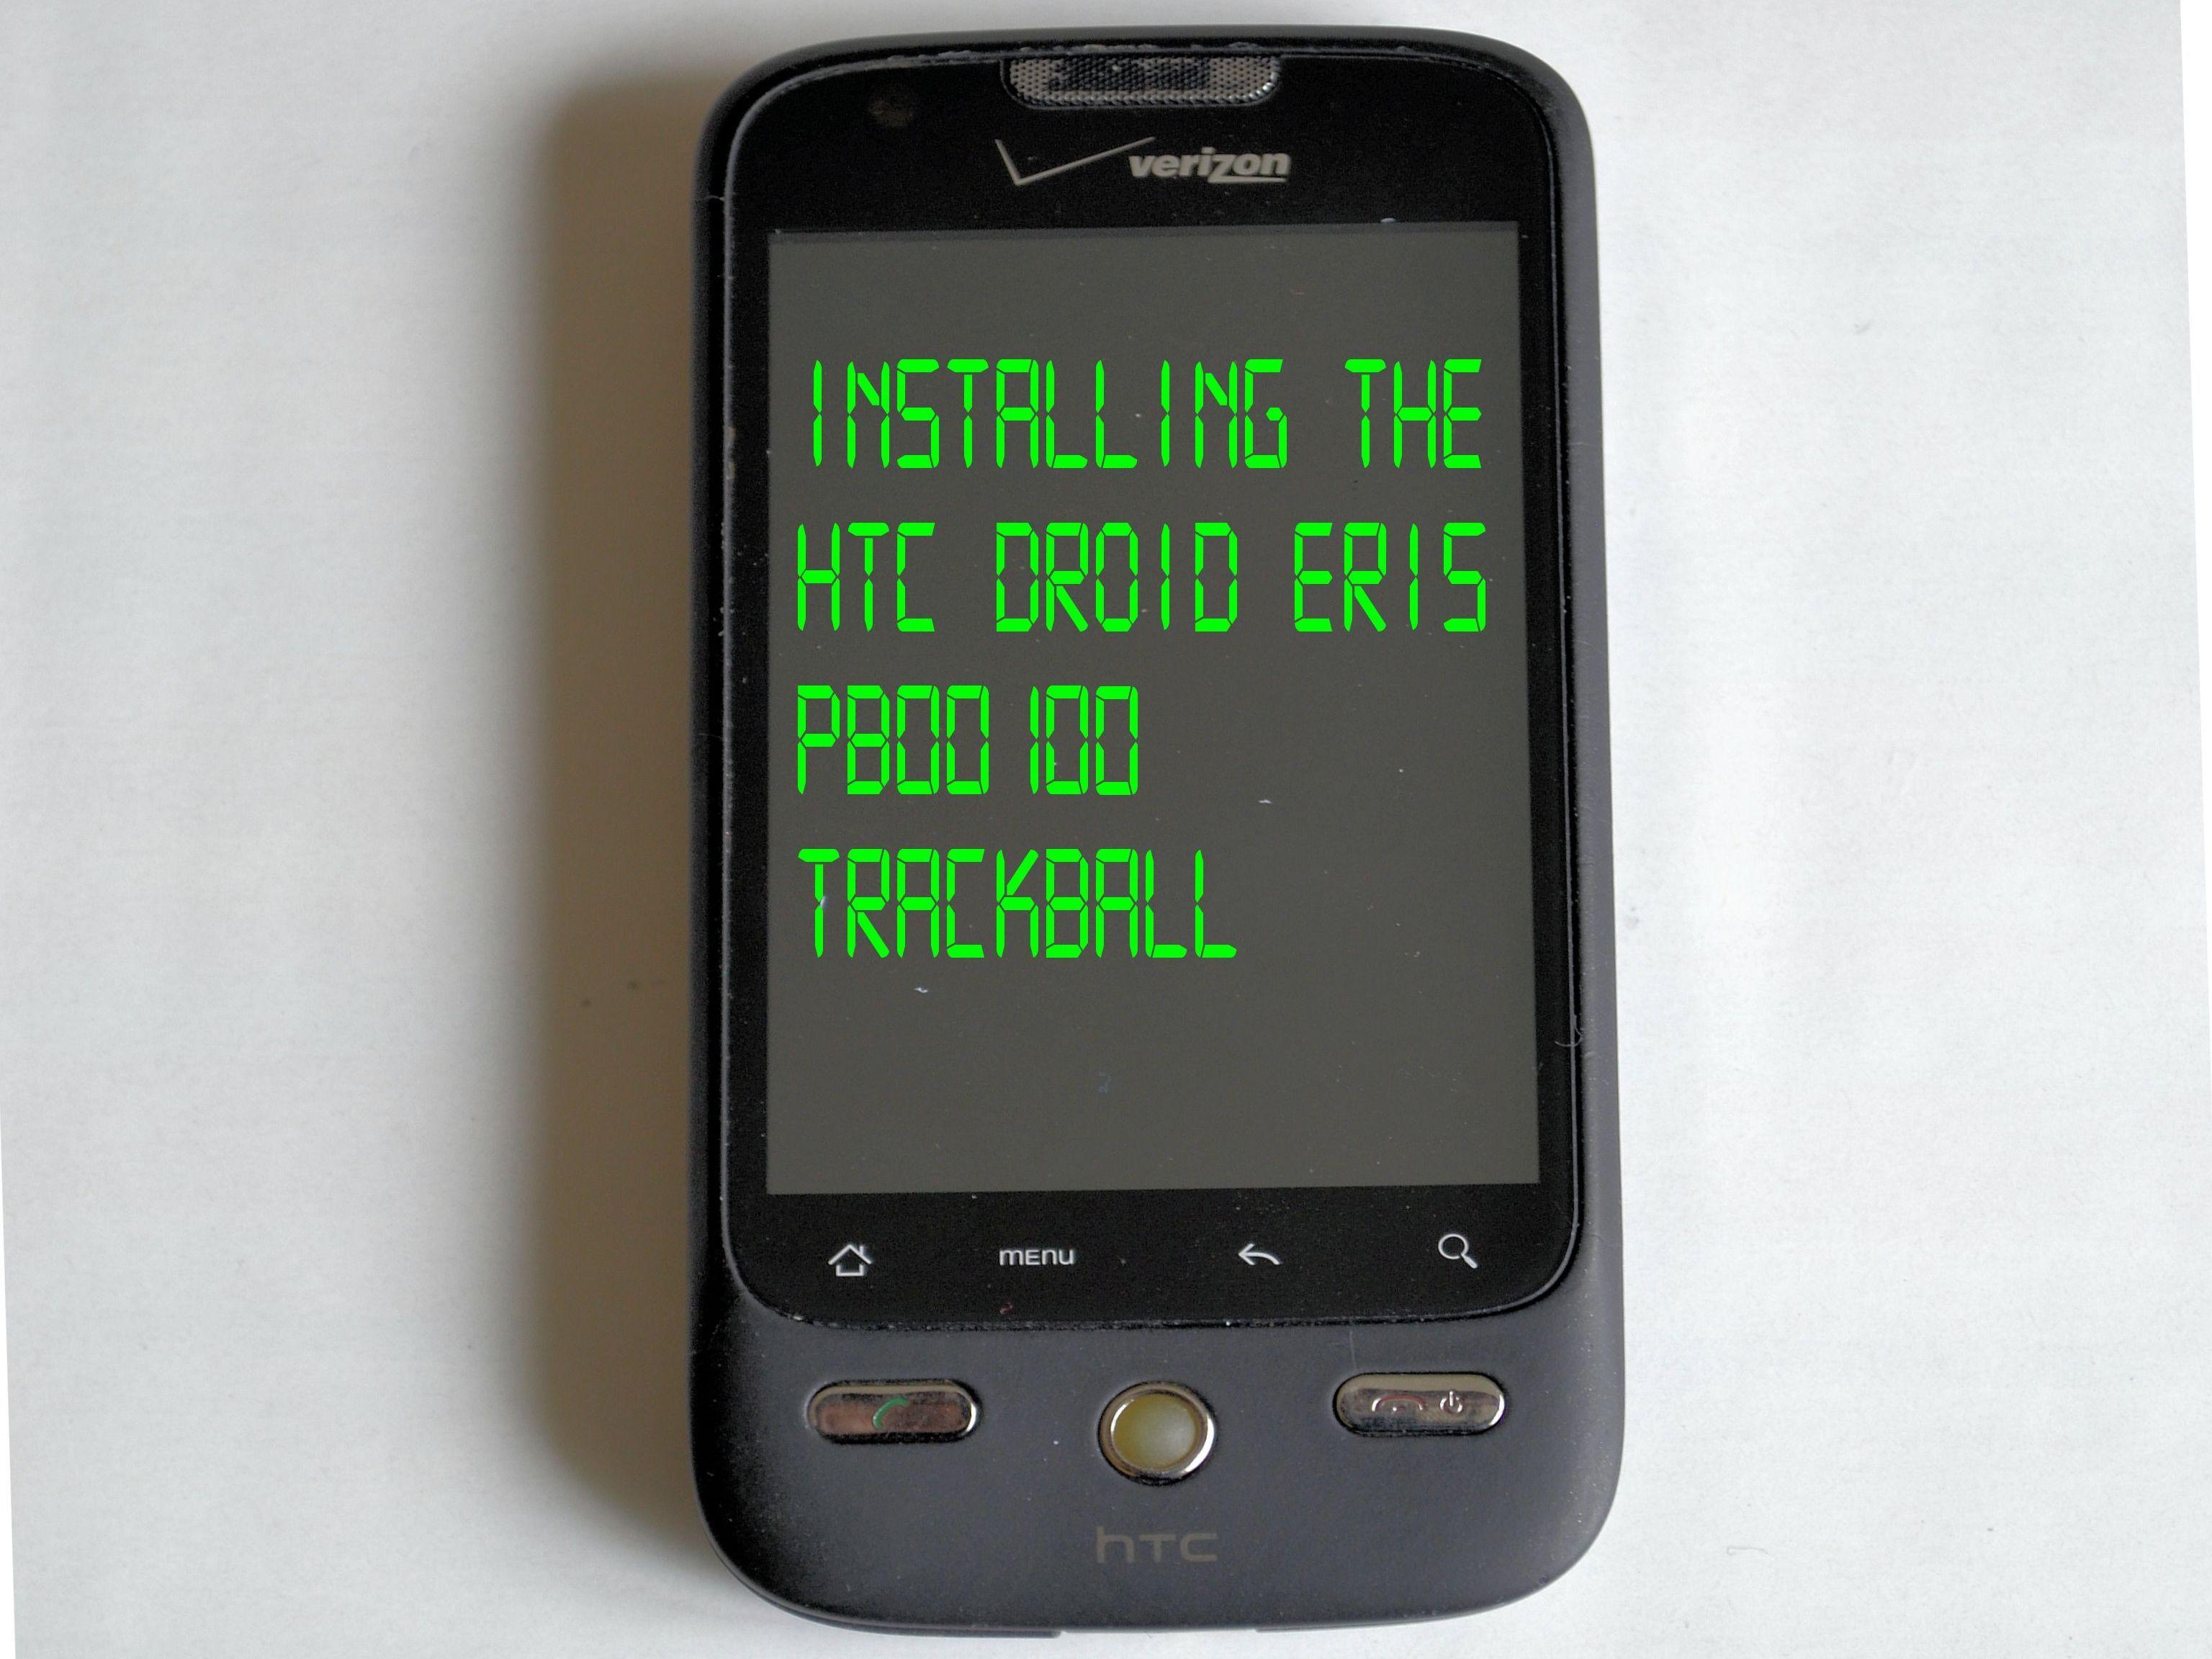 htc droid eris repair ifixit rh ifixit com HTC Droid Eris ADR6200 Droid Eris Charger